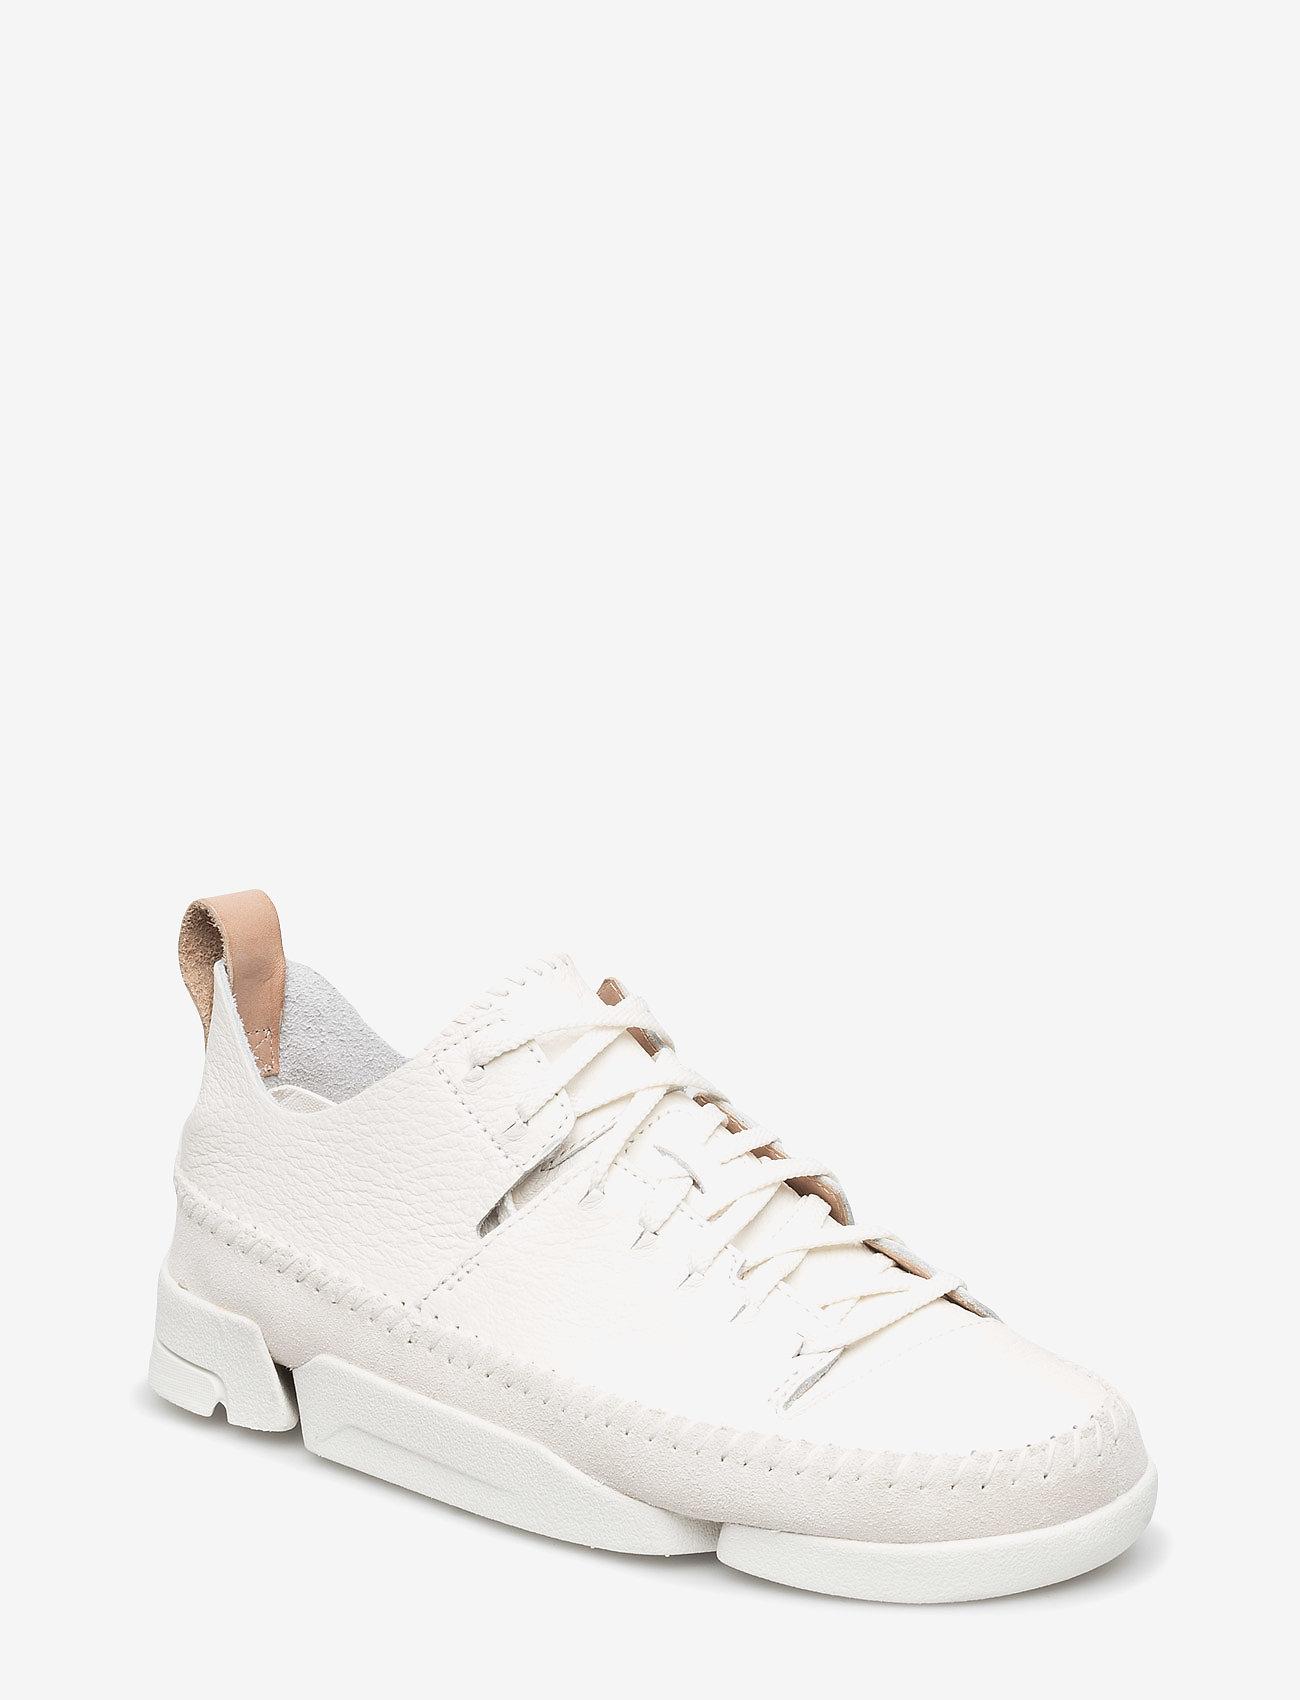 Trigenic Flex. (White) (120 €) - Clarks